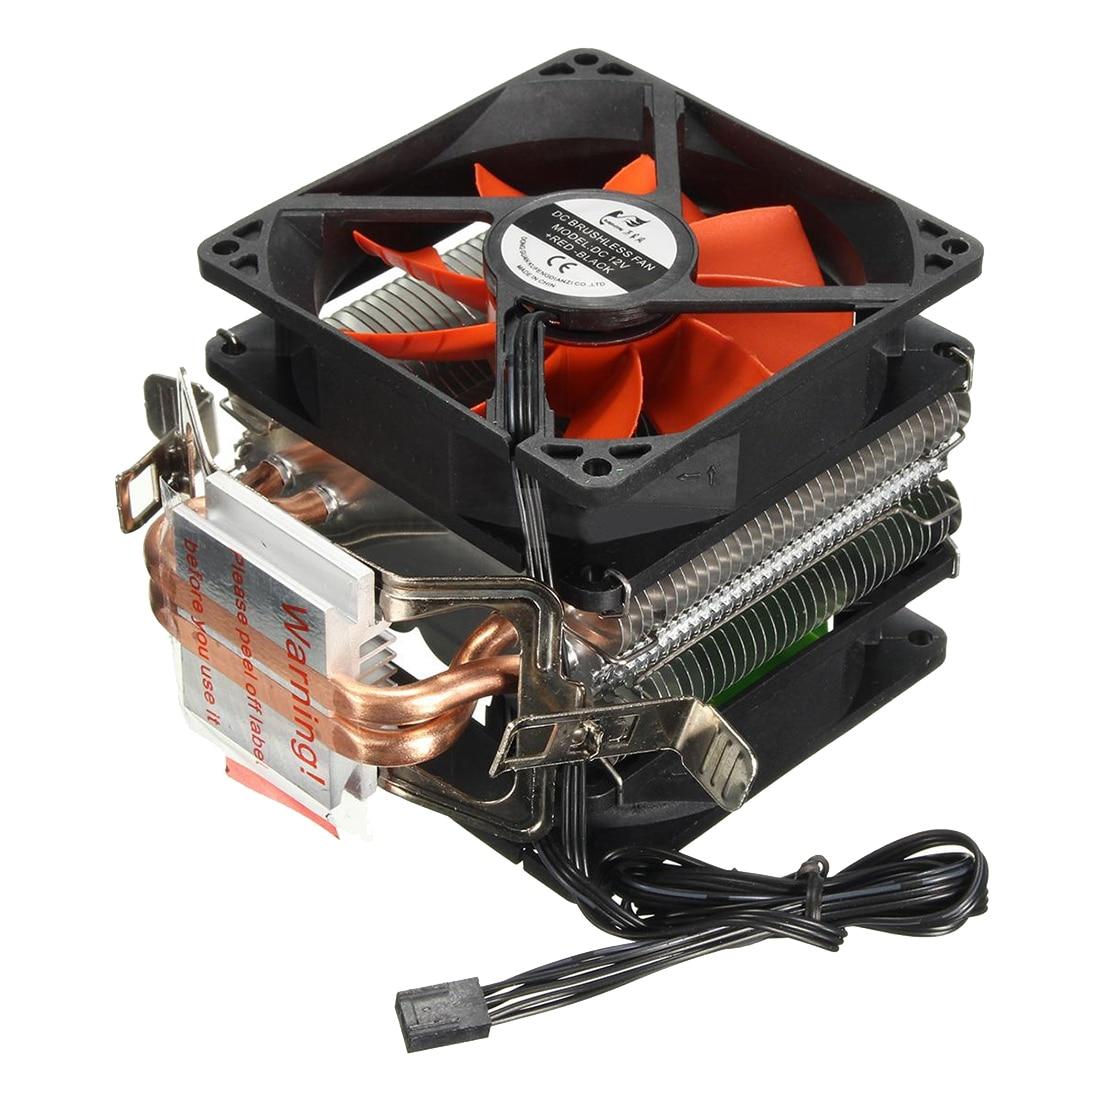 CPU cooler Silent Fan For Intel LGA775 / 1156/1155 AMD AM2 / AM2 + / AM3 кулер thermaltake silent 1156 clp0552 1156 fan 9 cm 800 1700 rpm